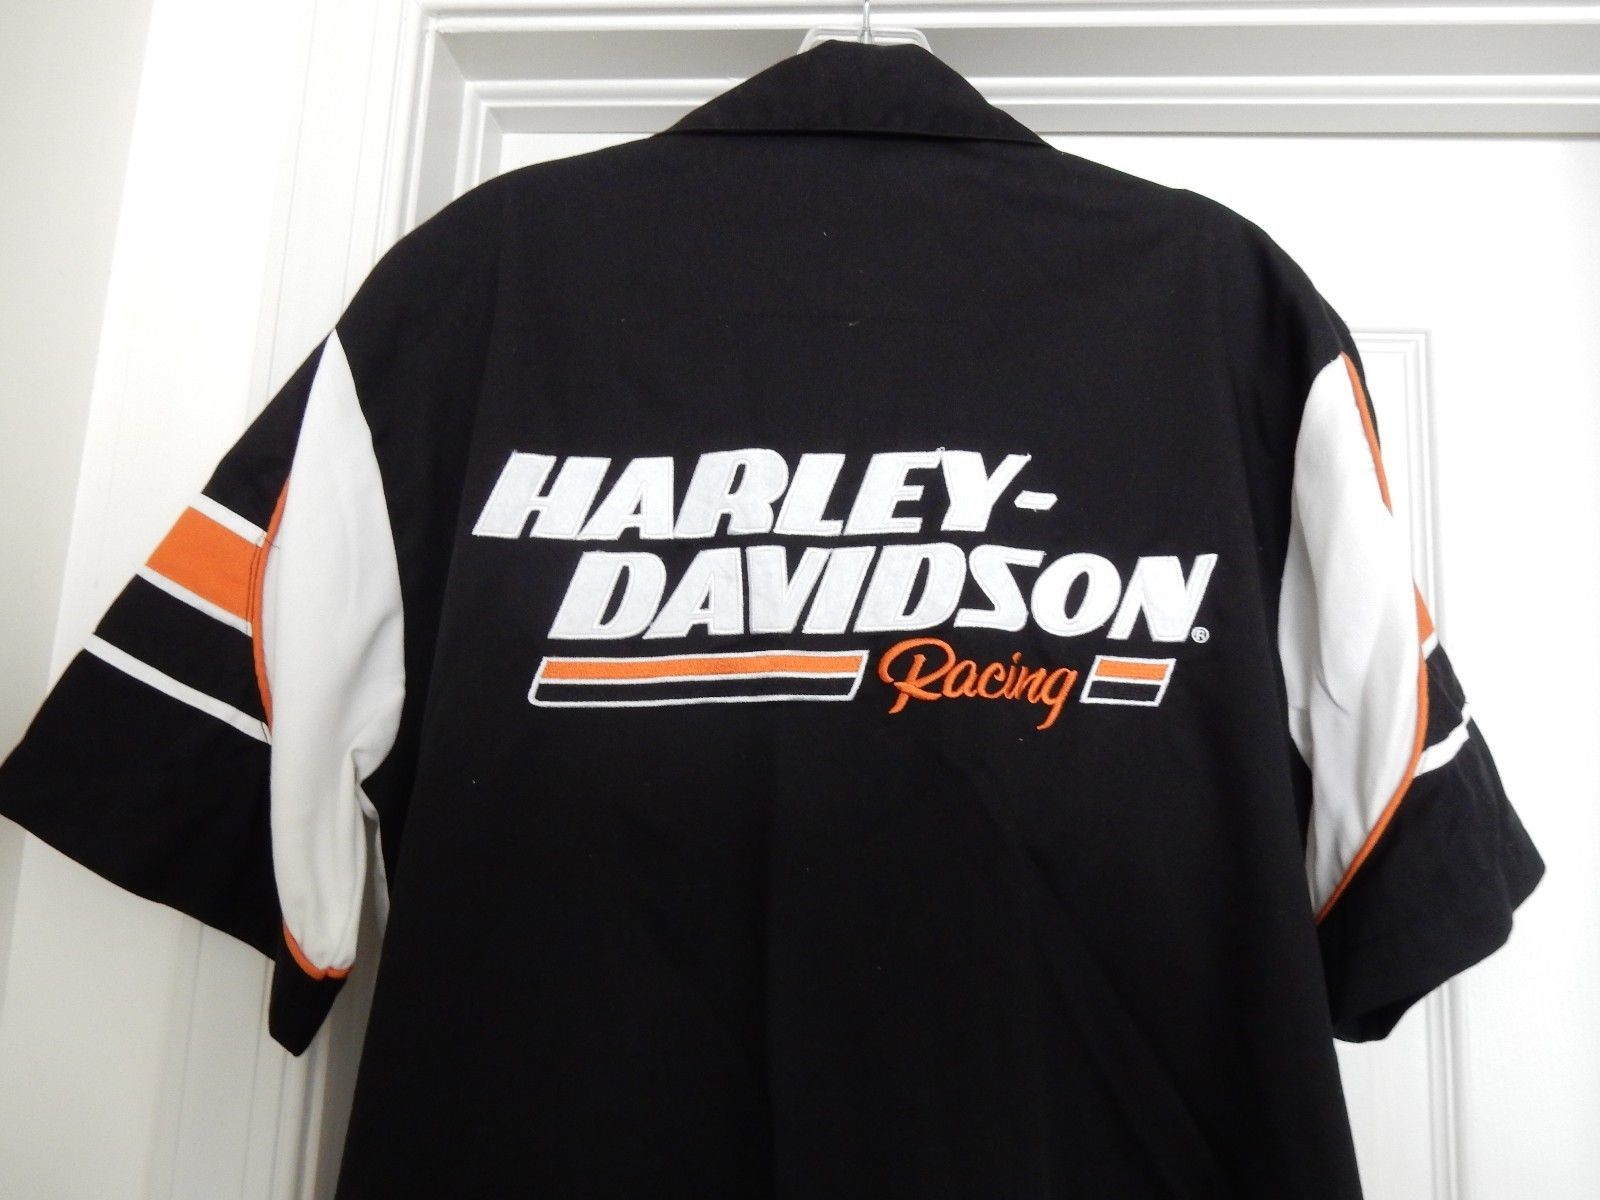 Harley-Davidson Racing Screamin' Eagle Garage Shirt Top S/S Cotton Blend Size M image 4